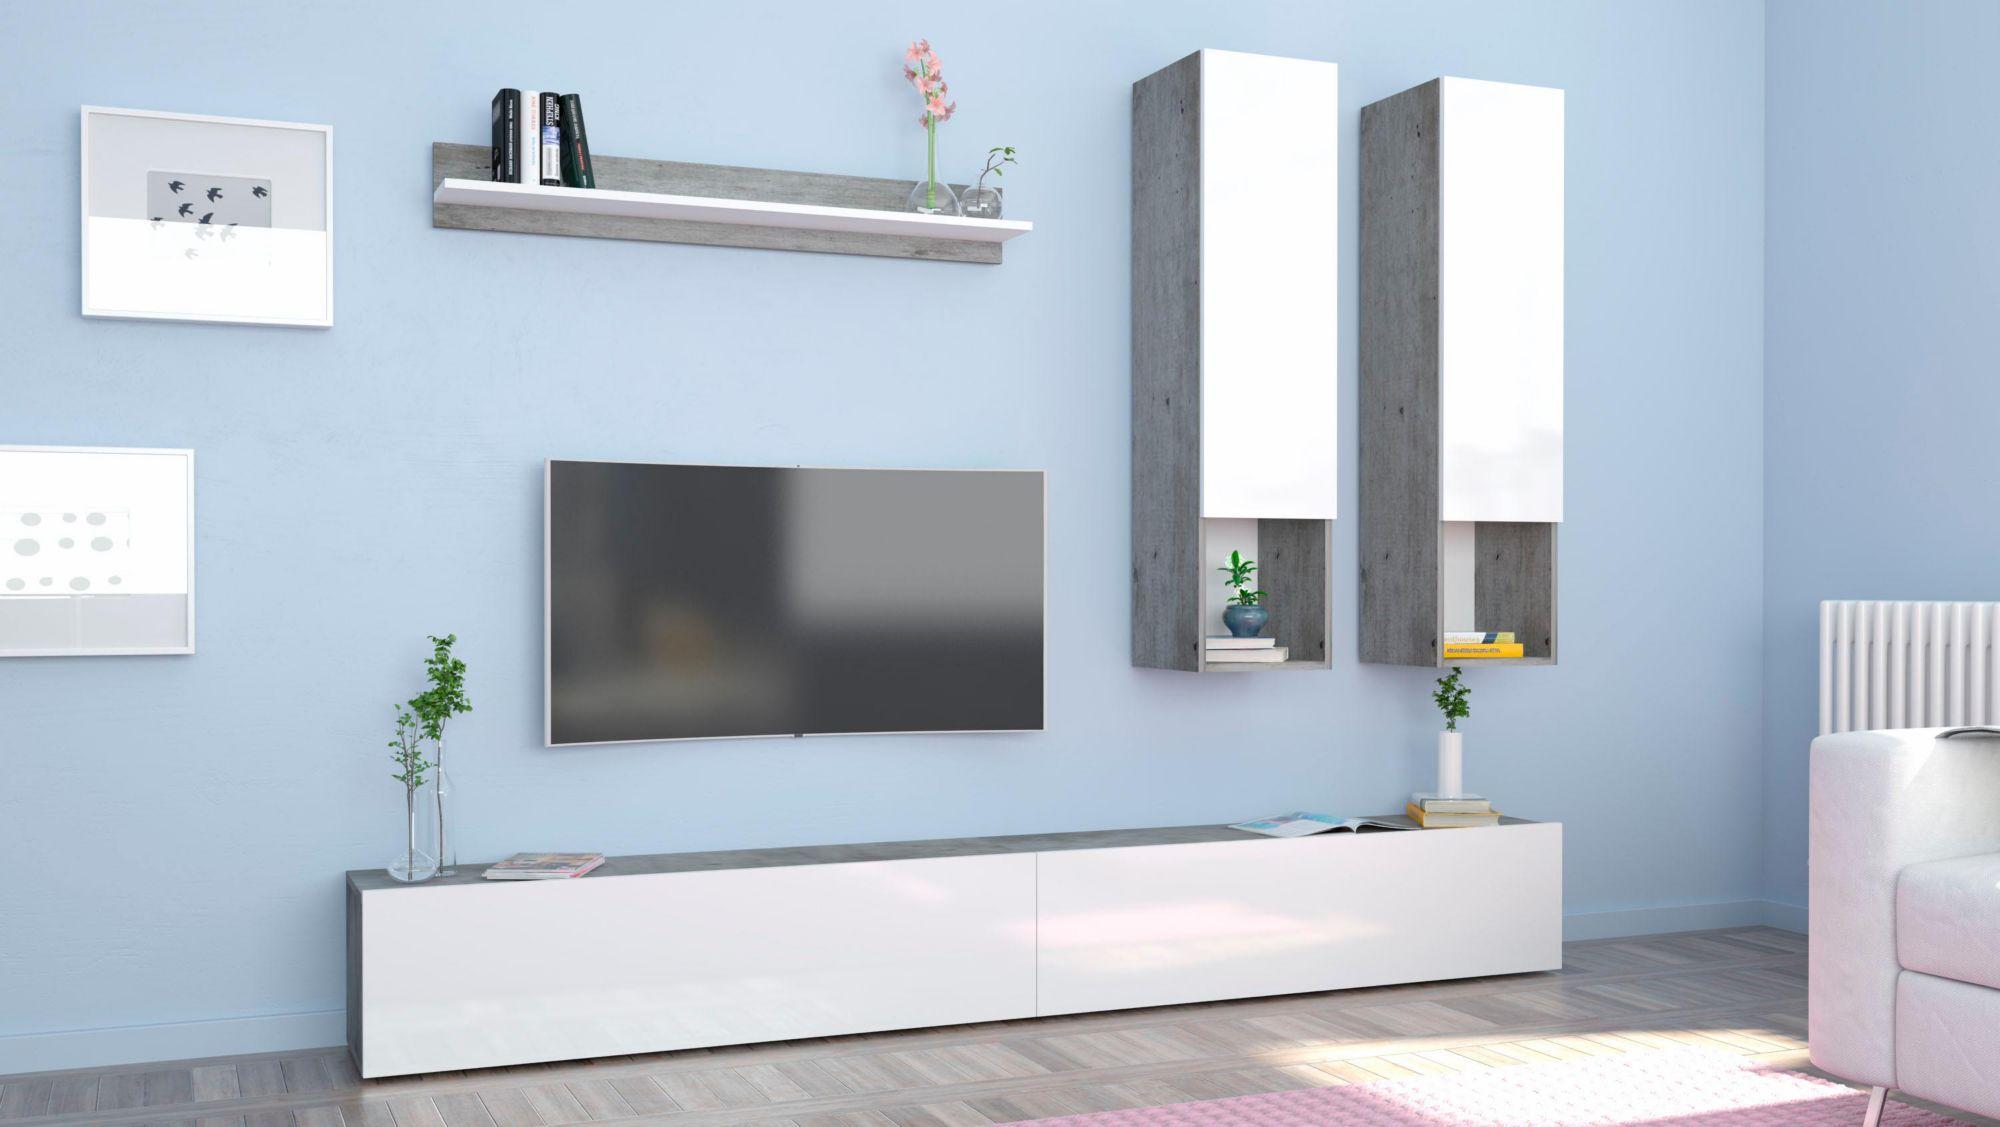 Tecnos Wohnwand (5-tlg.) | Schwab.de | Wohnwände & TV-Möbel